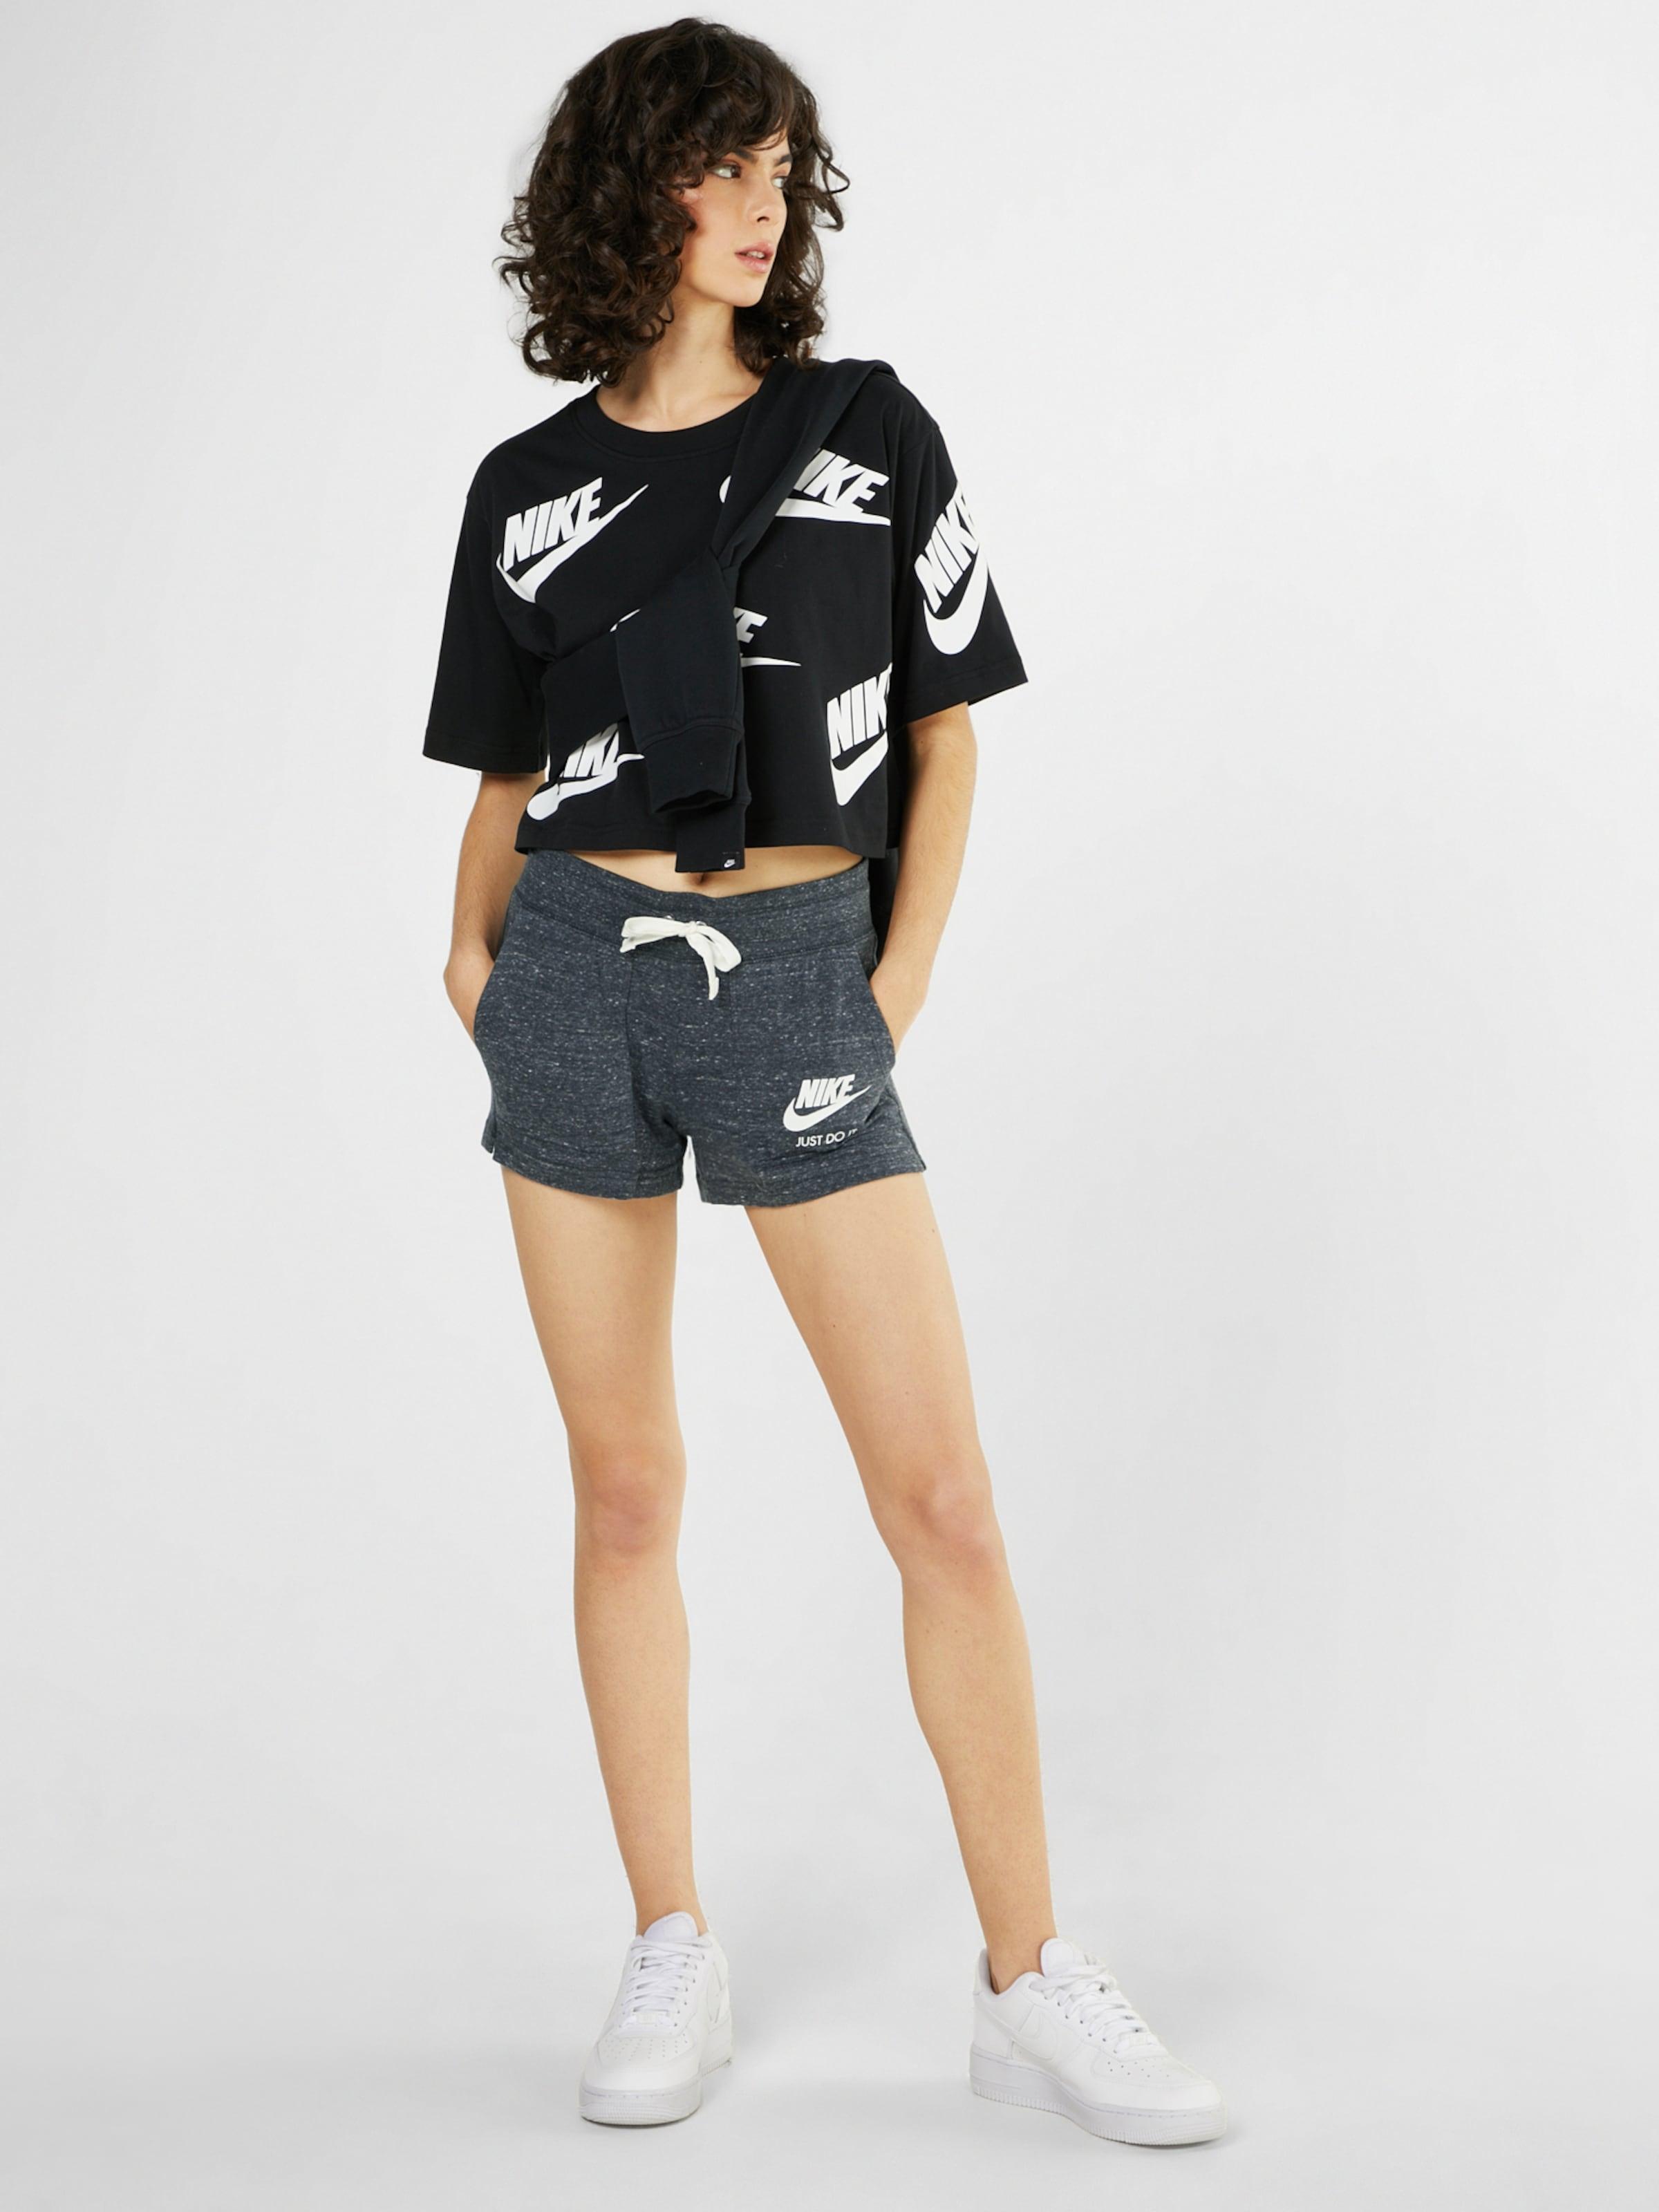 Sportswear Short In Anthrazit Nike 'vintage' reQoCxBdW